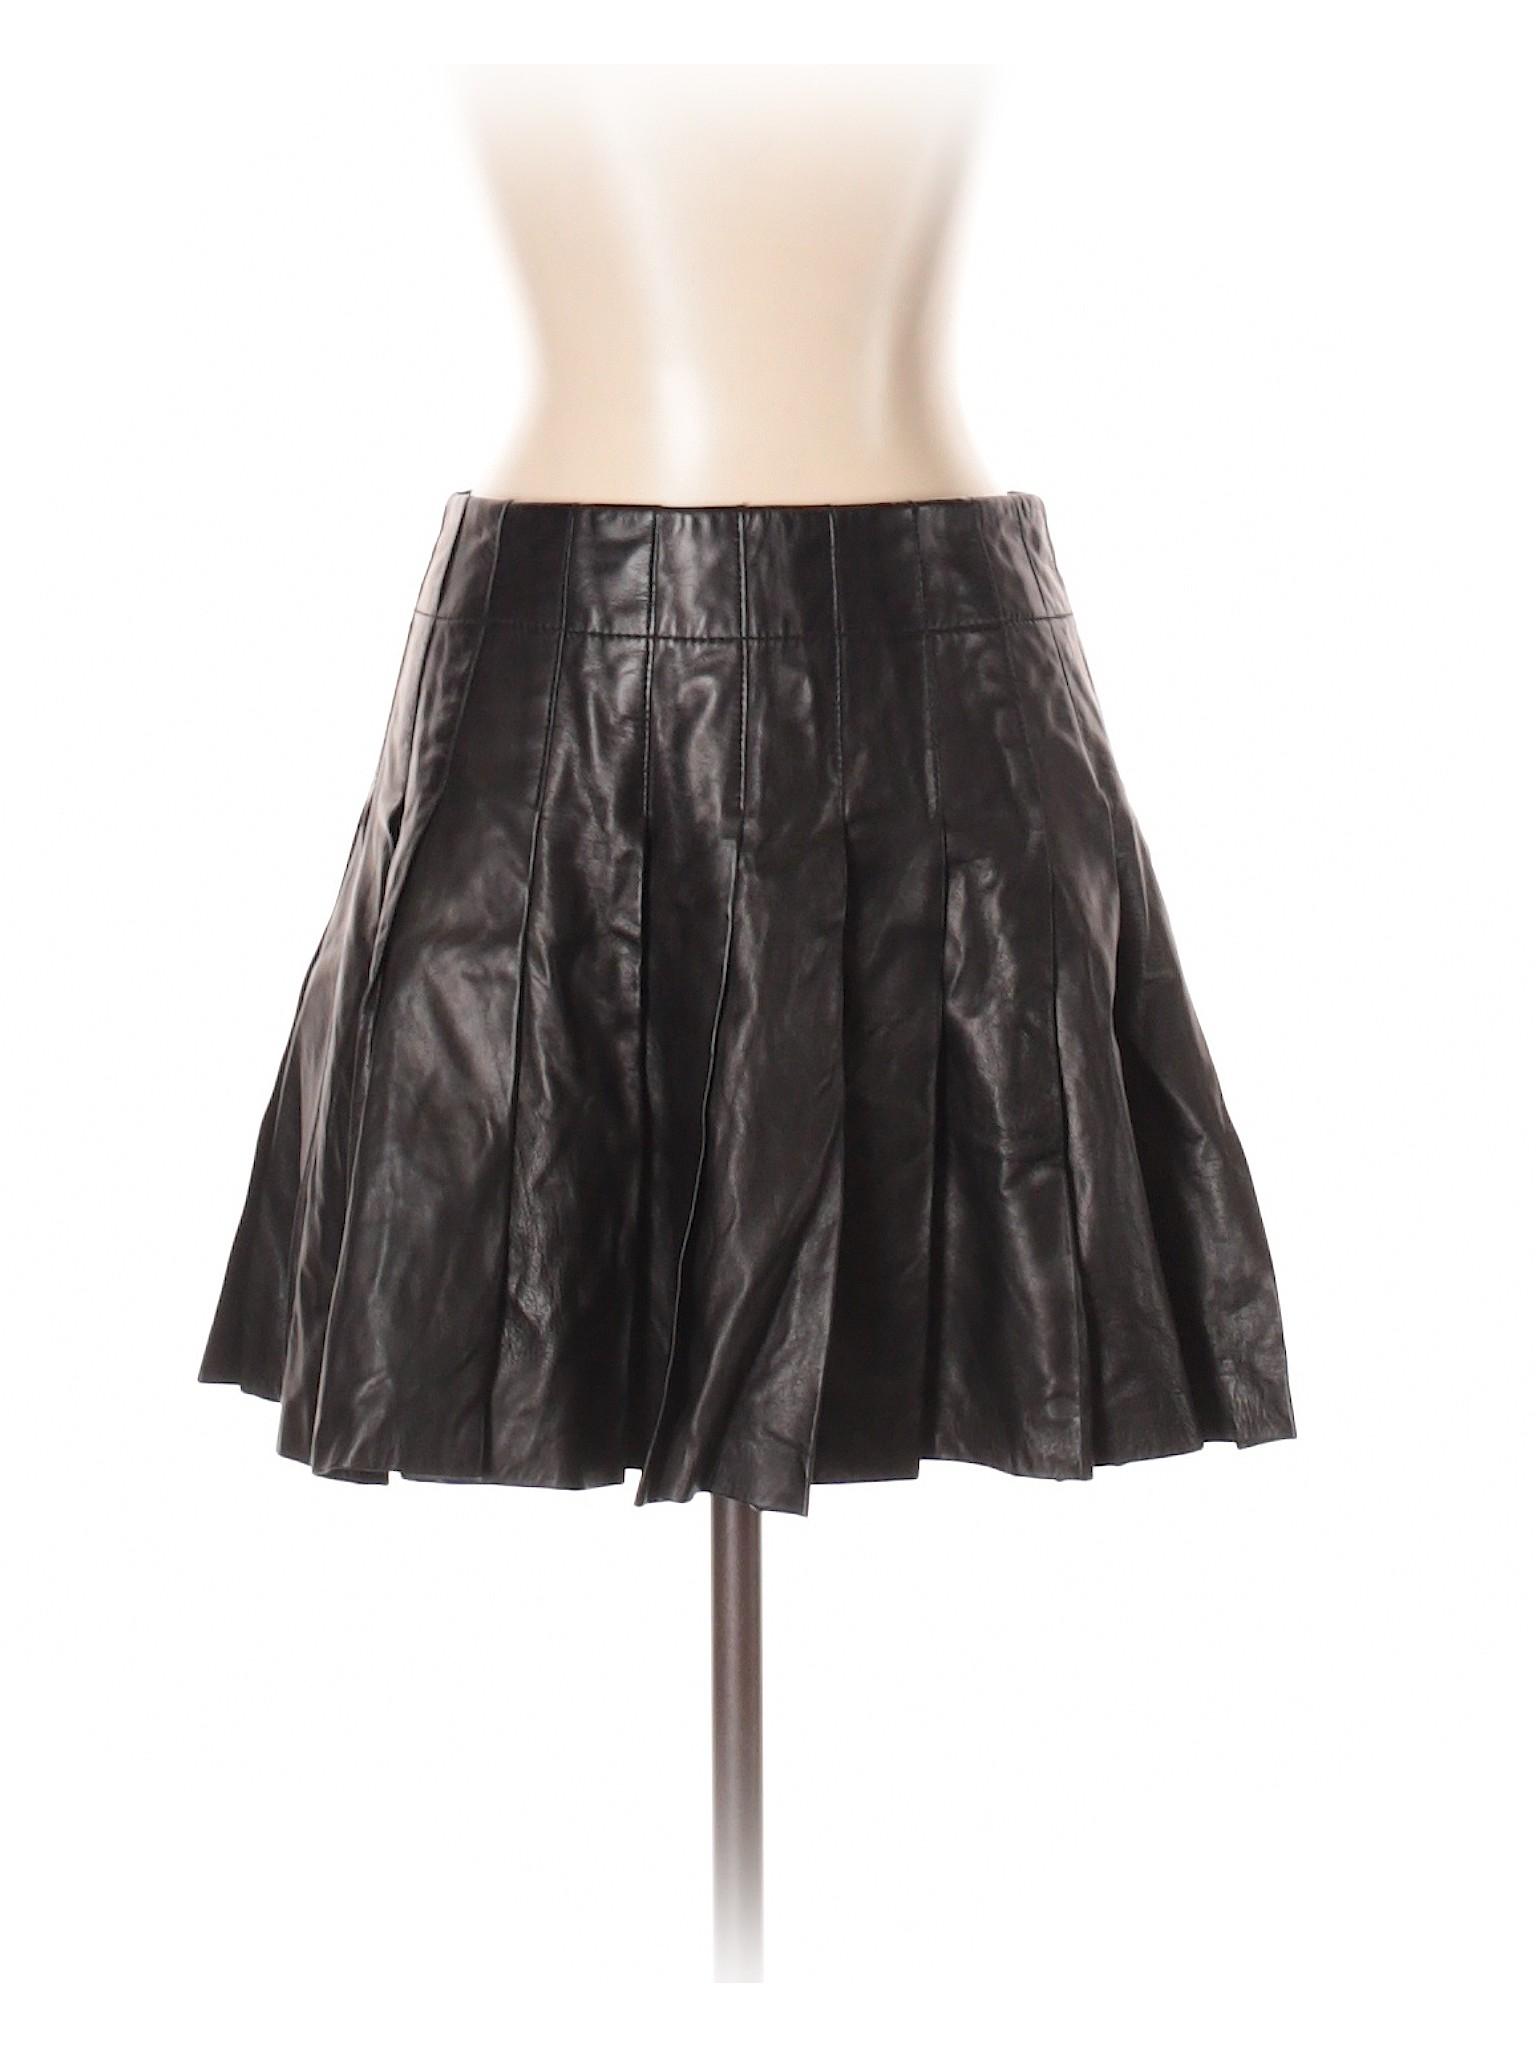 Skirt winter Leather Leisure olivia alice v06nWvq4